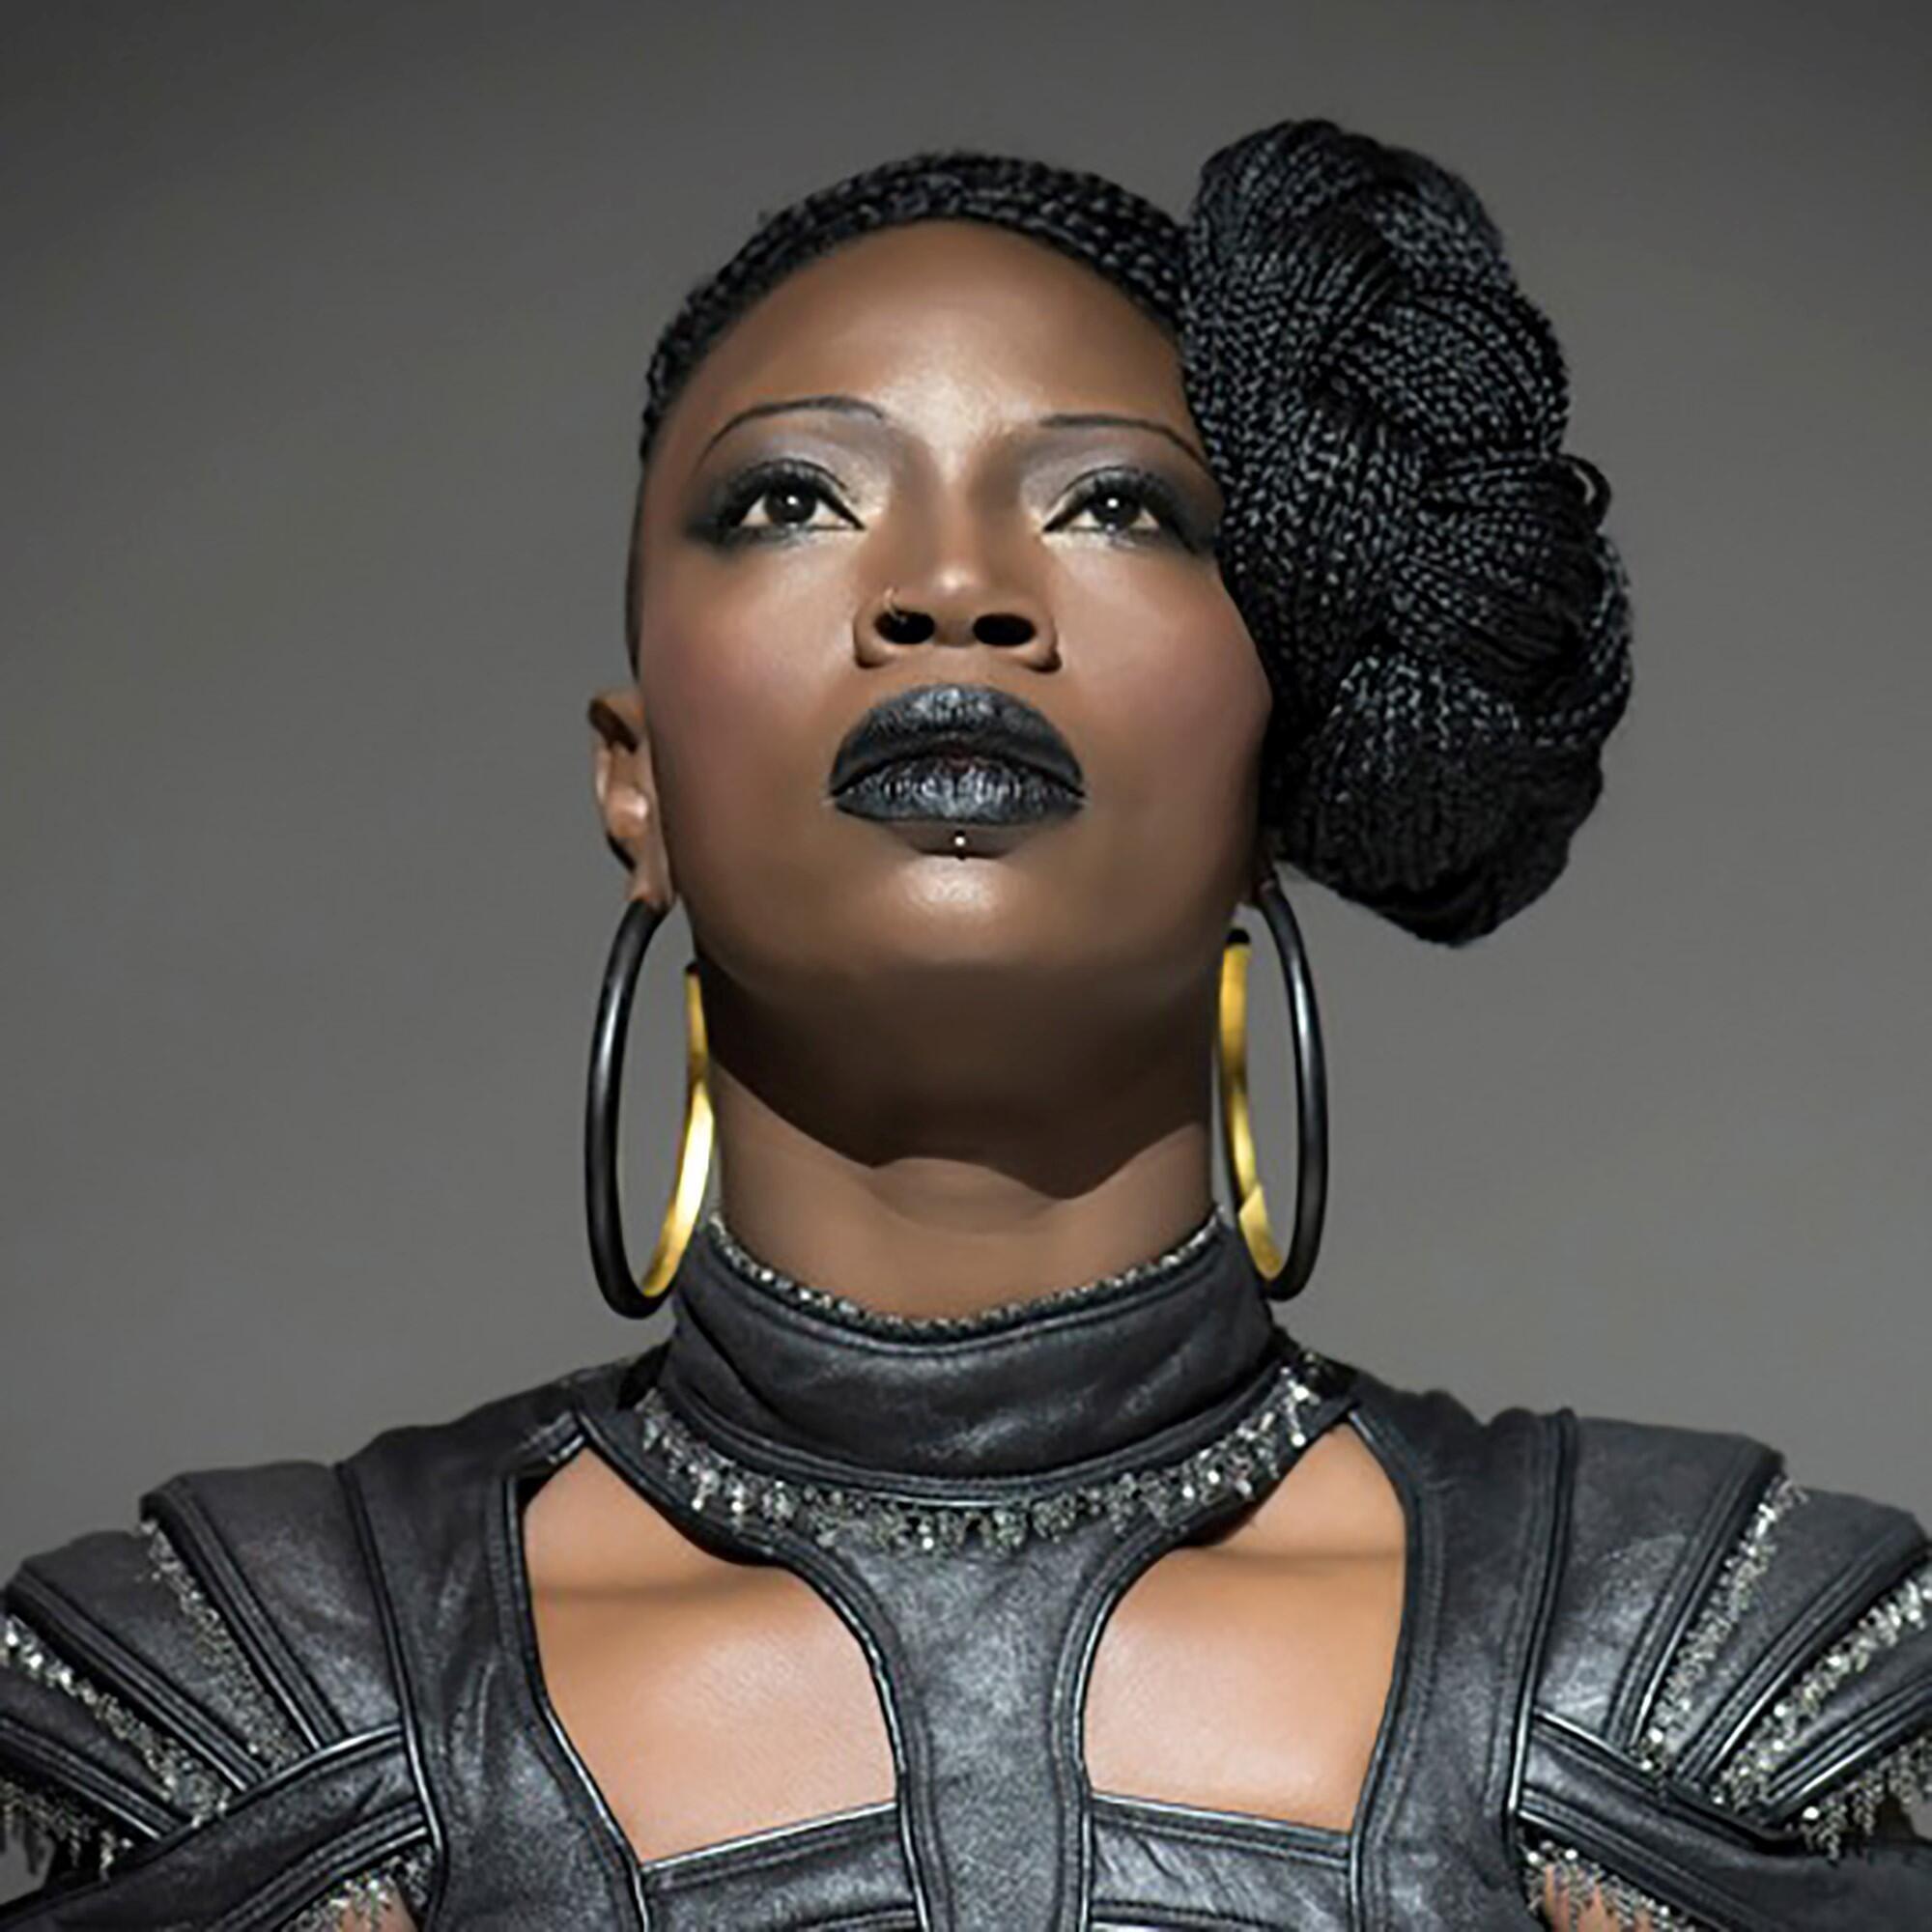 Dobet Ghanoré releases her fifth album, Miziki, on 4 May 2018